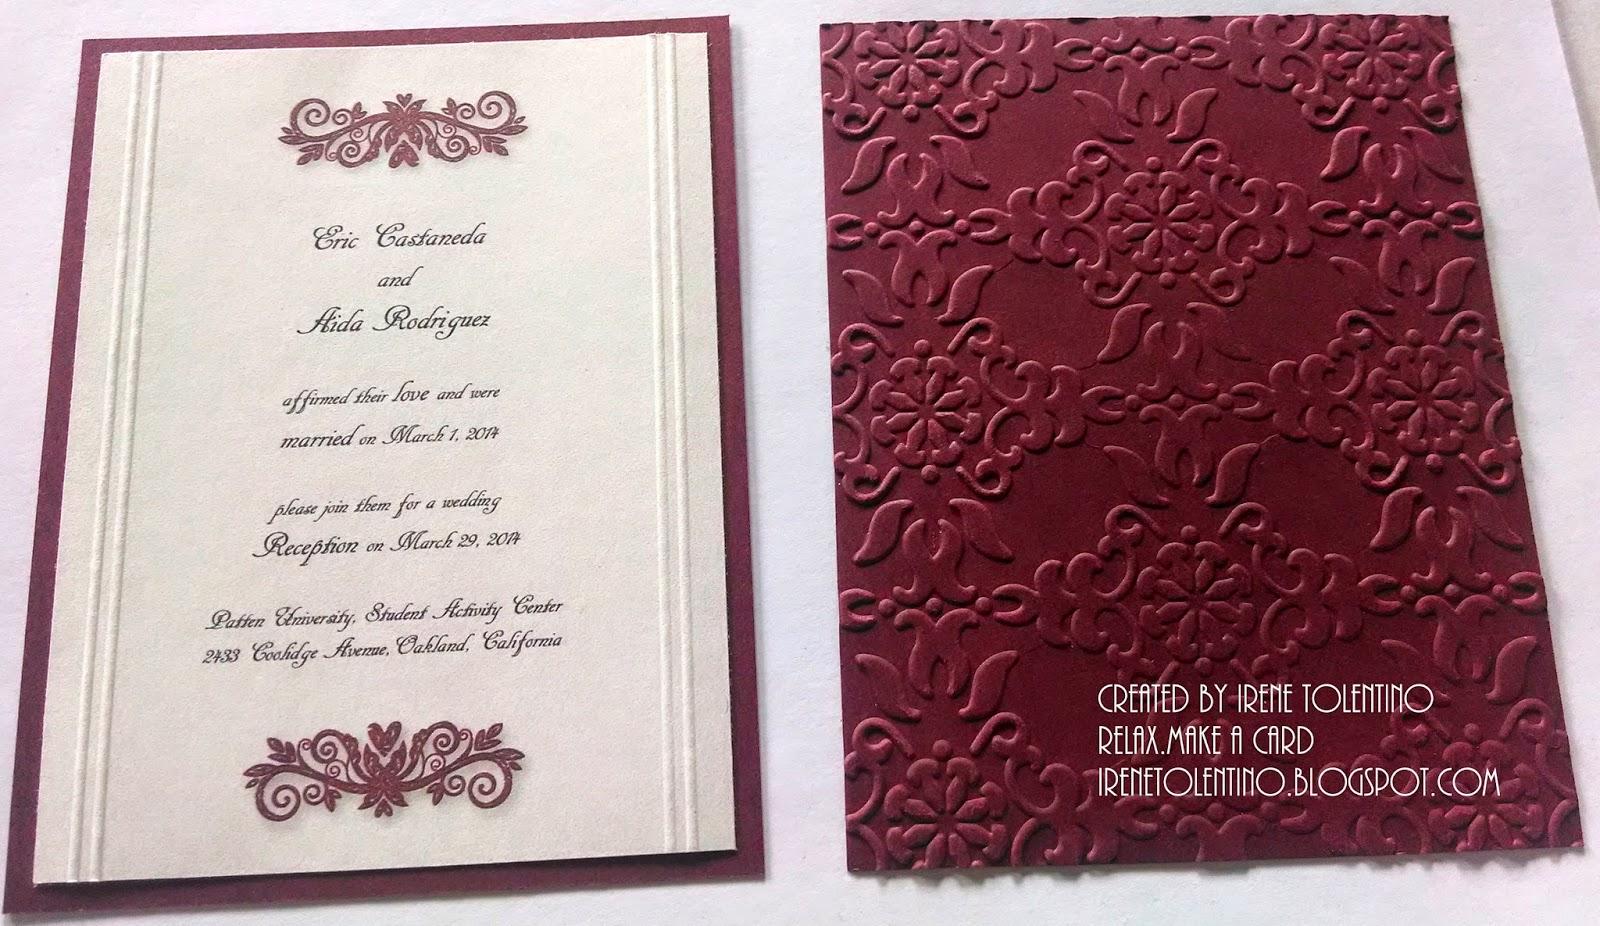 Relax. Make a Card: Burgundy Wedding Reception Invitations